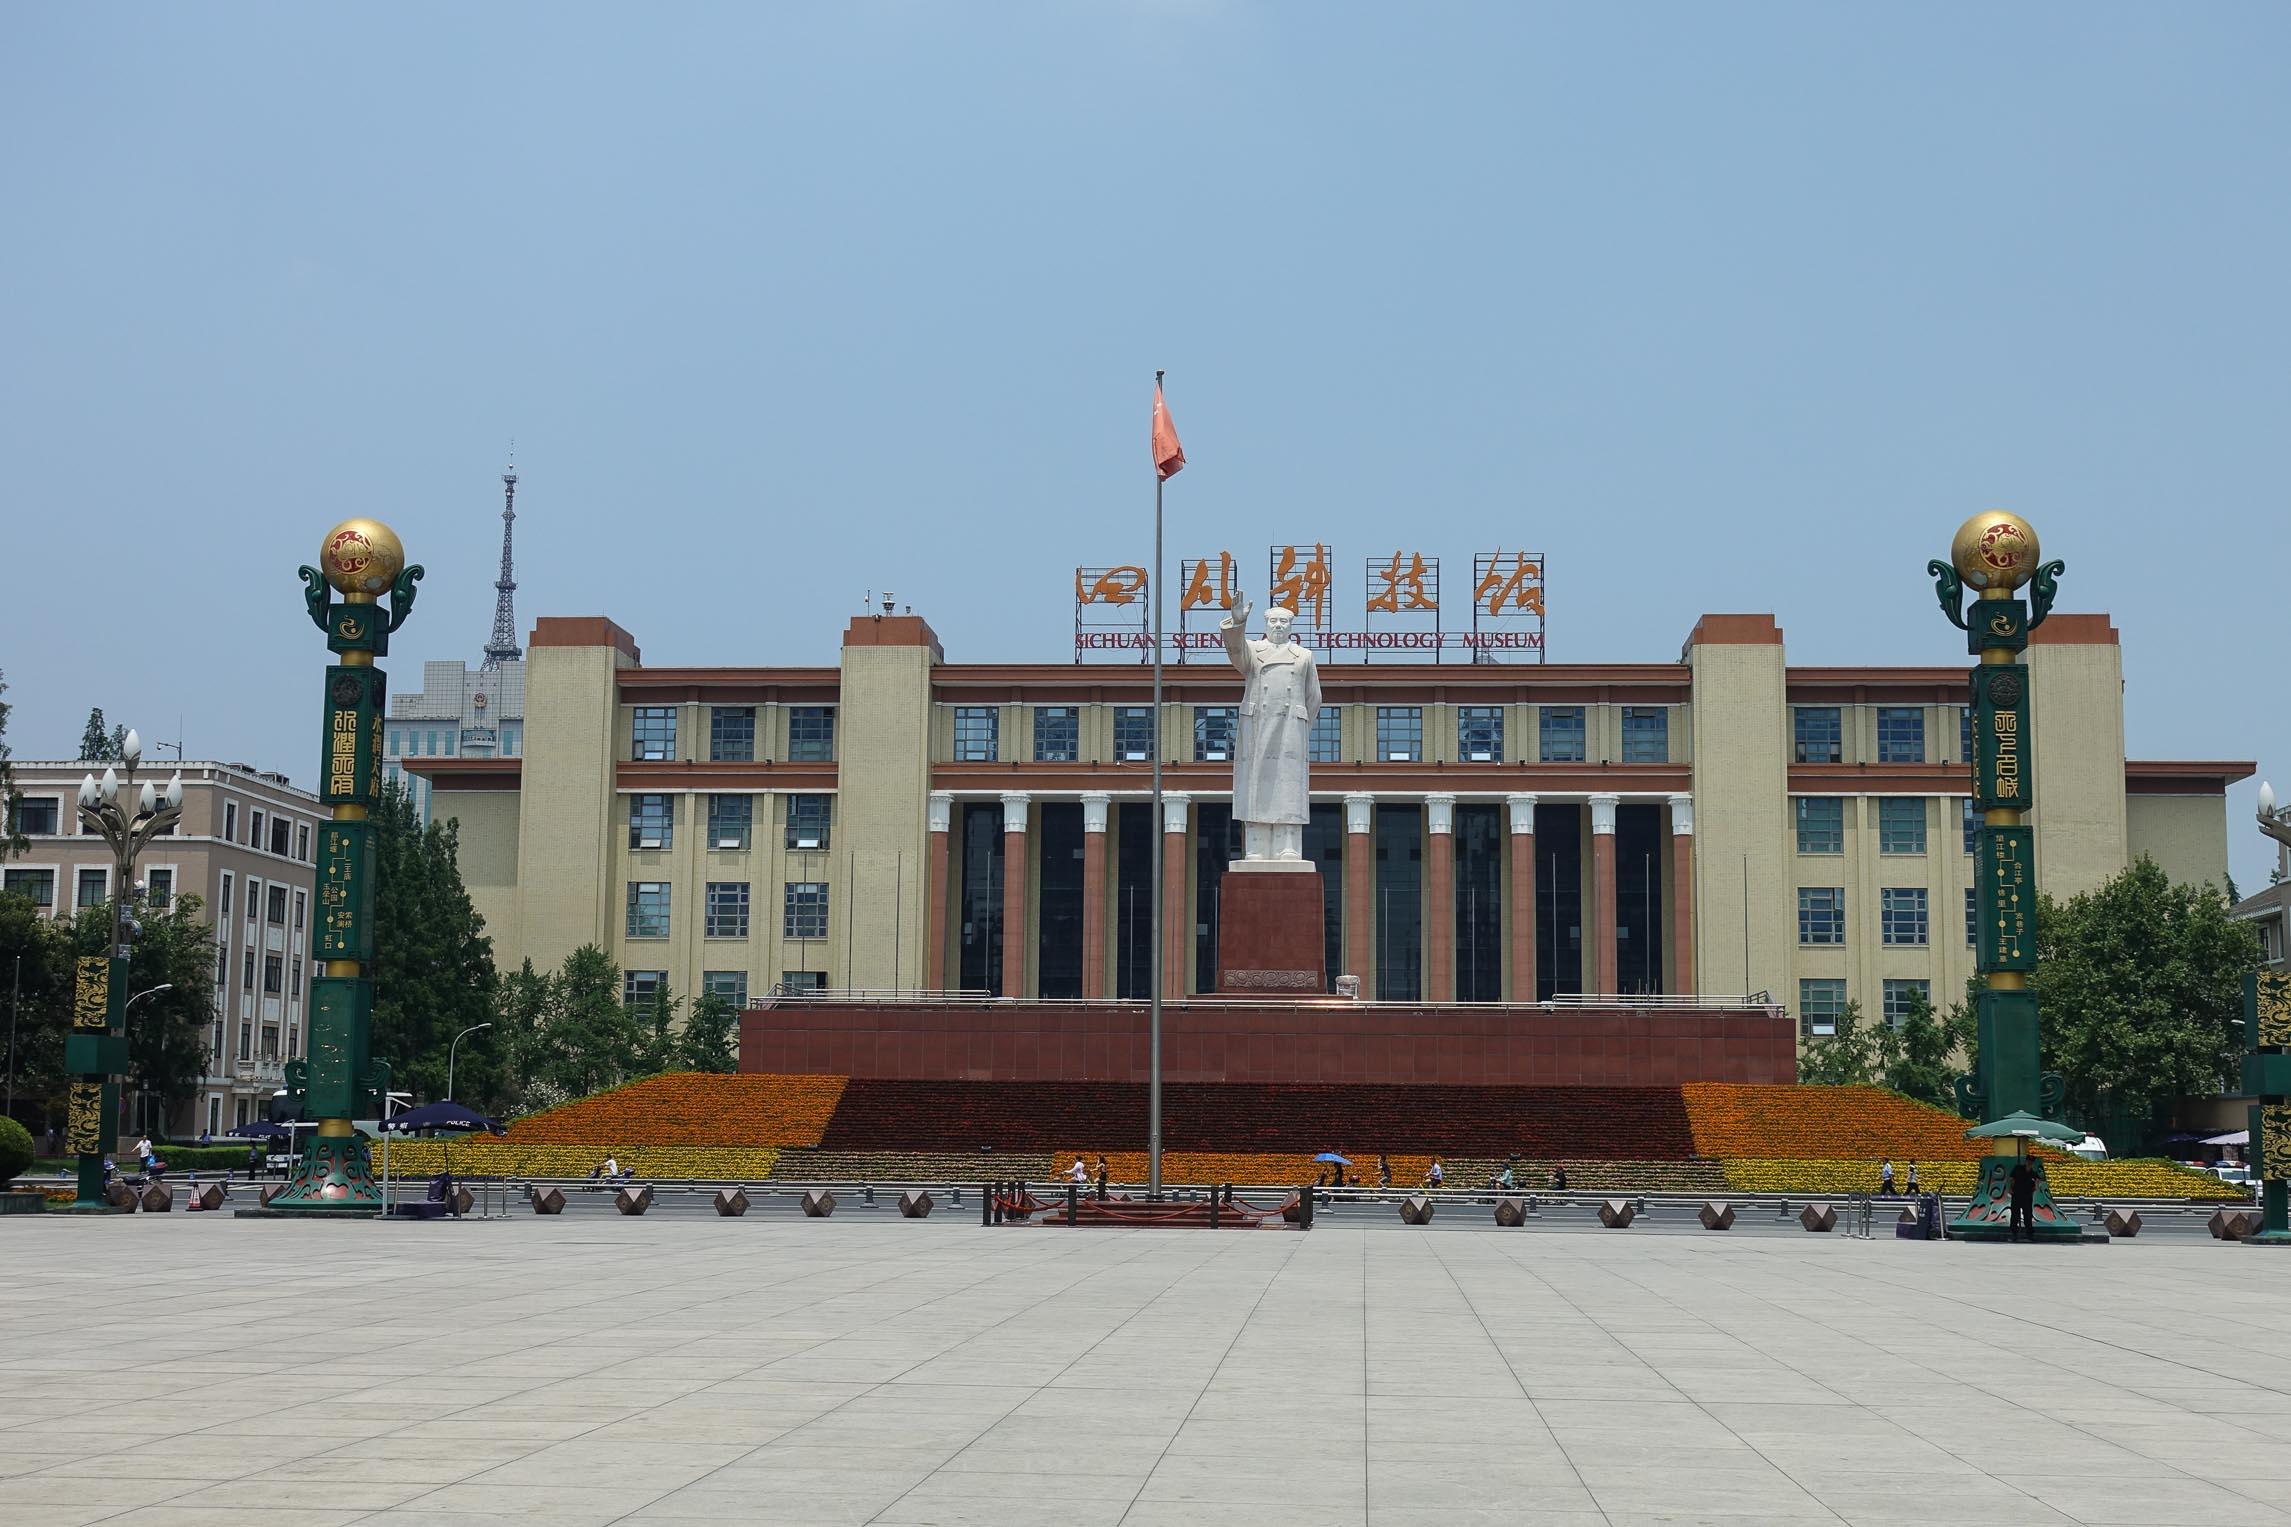 Mao Zedong statue in Chengdu